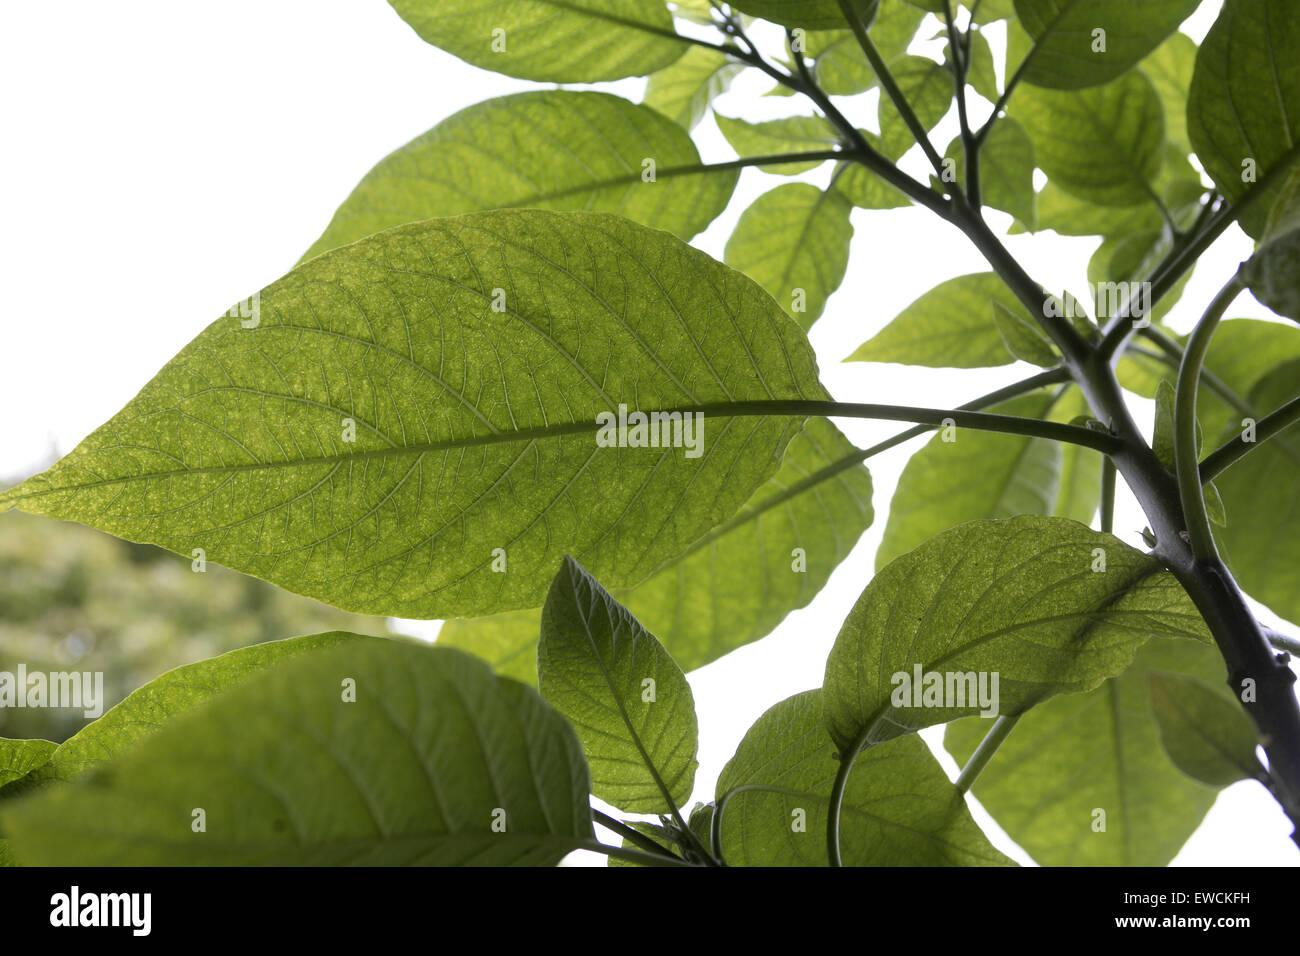 DEU, Germany, leaves of a Angel Trumpet (lat. Brugmansia). - Stock Image